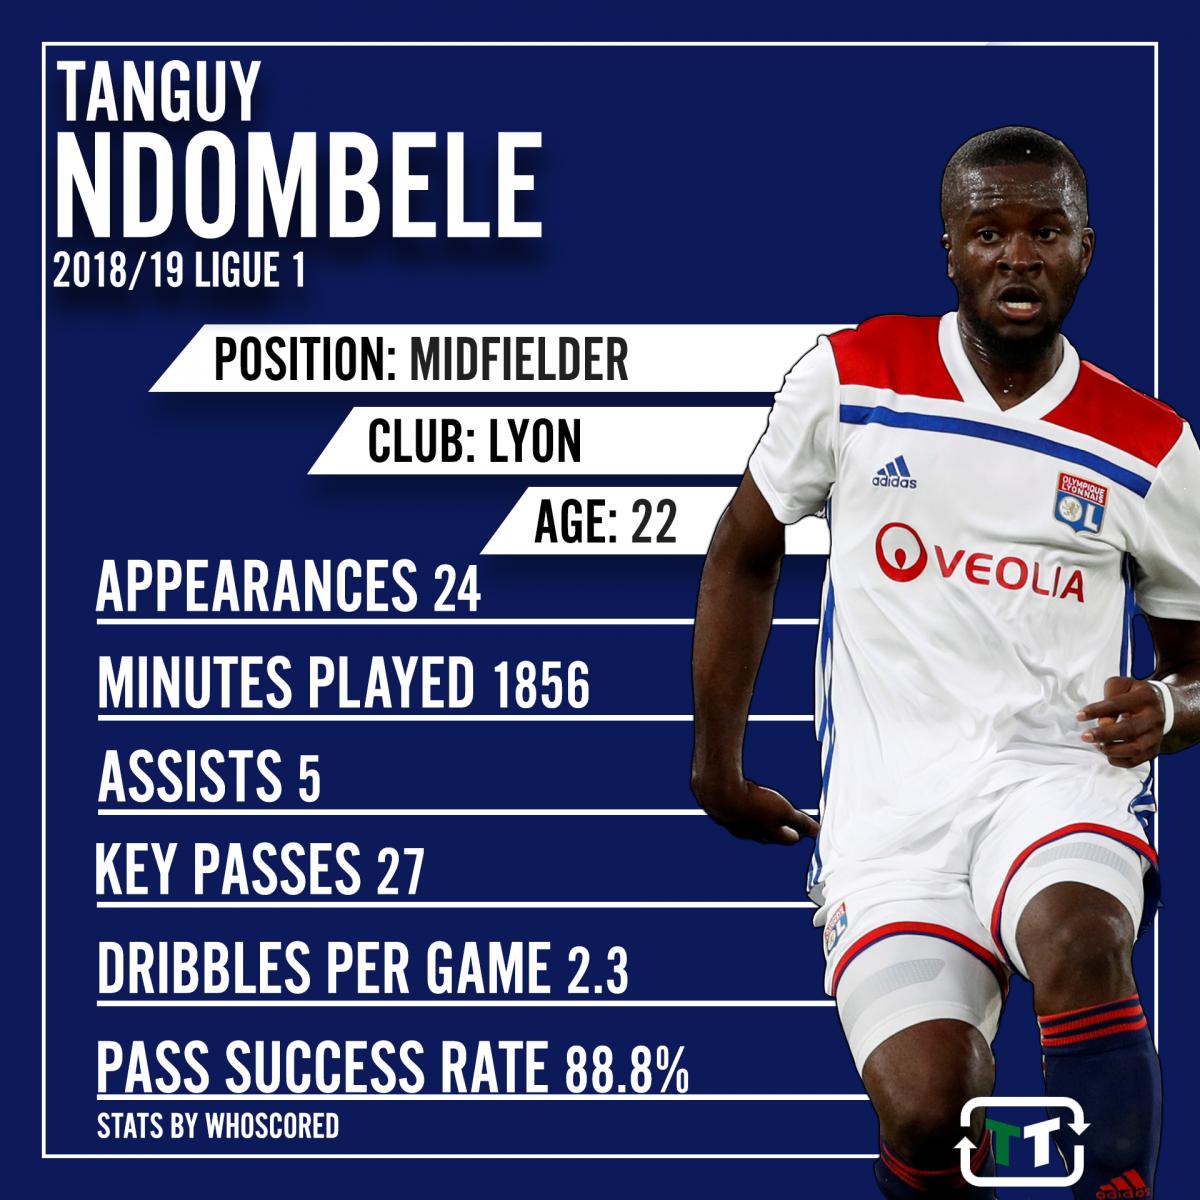 Ndombele-stats.png